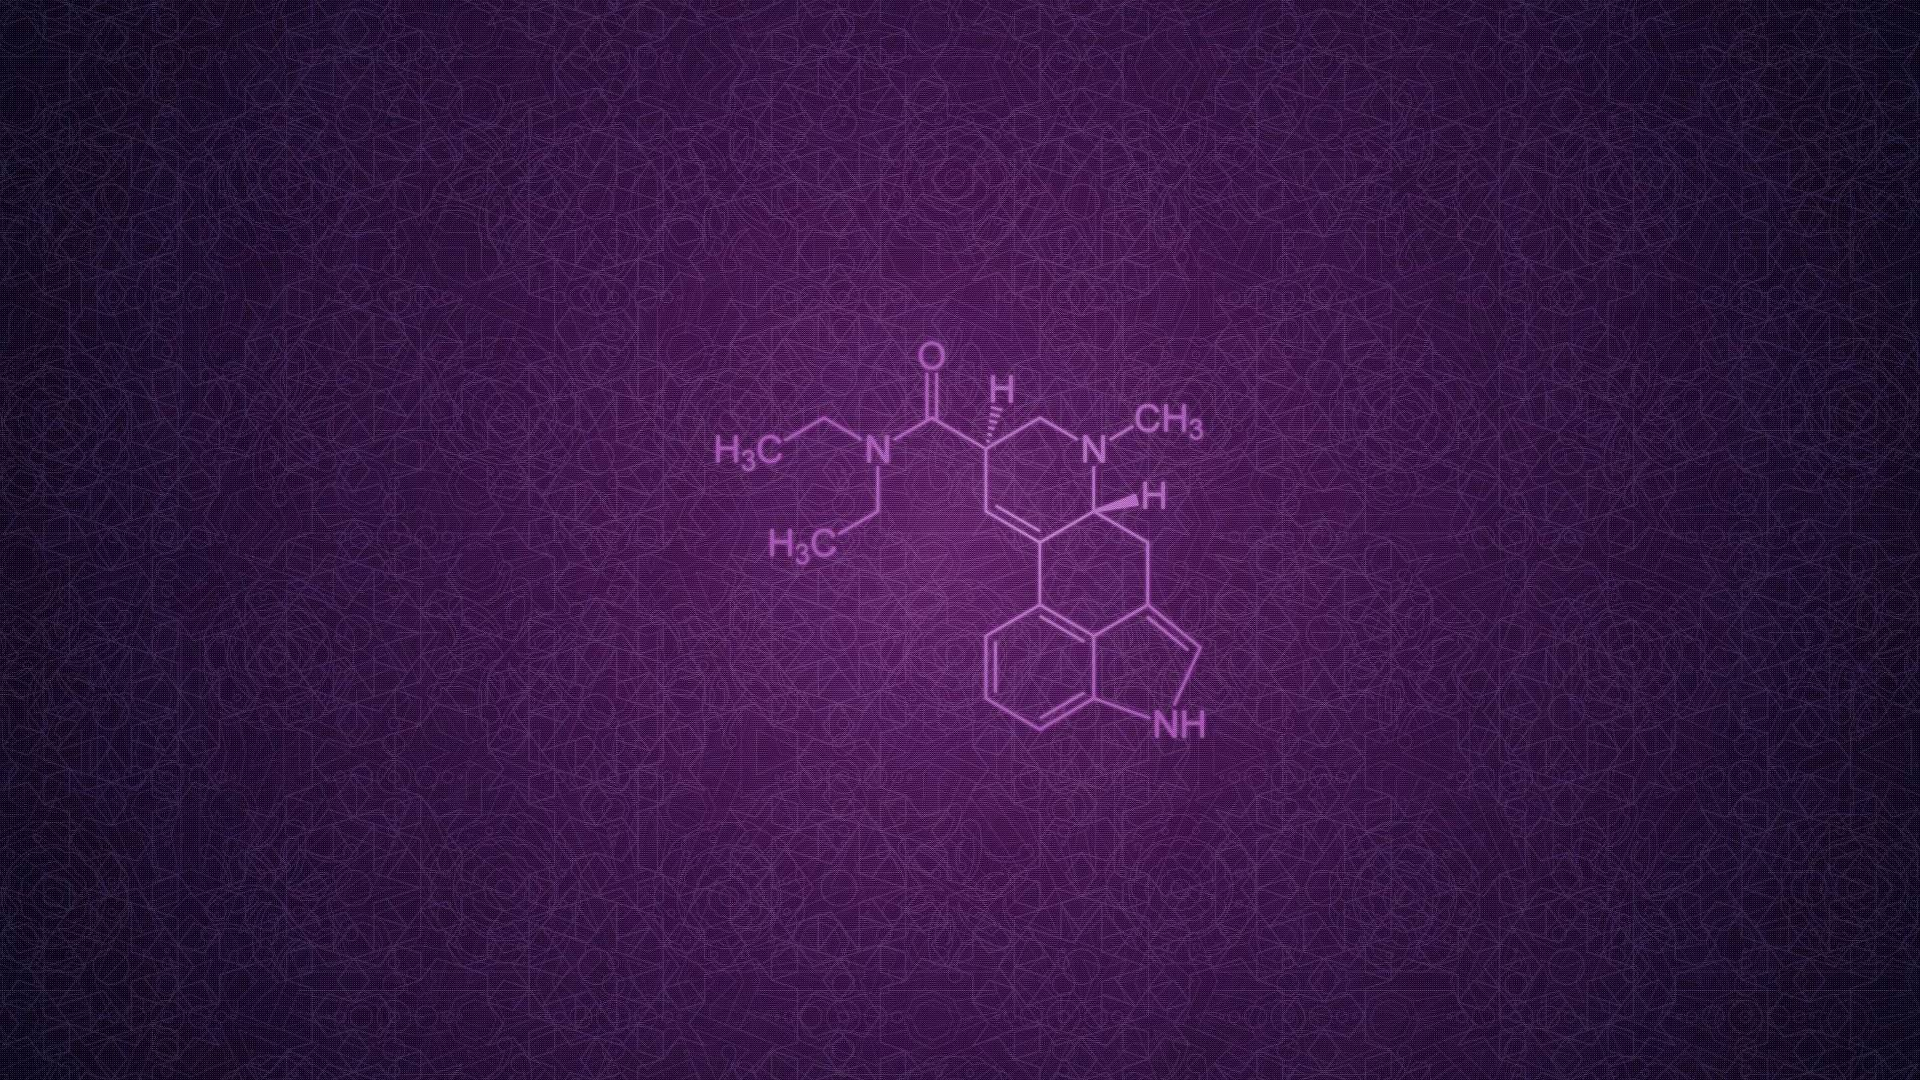 molecule-typography-hd-wallpaper-1920x1080-9815